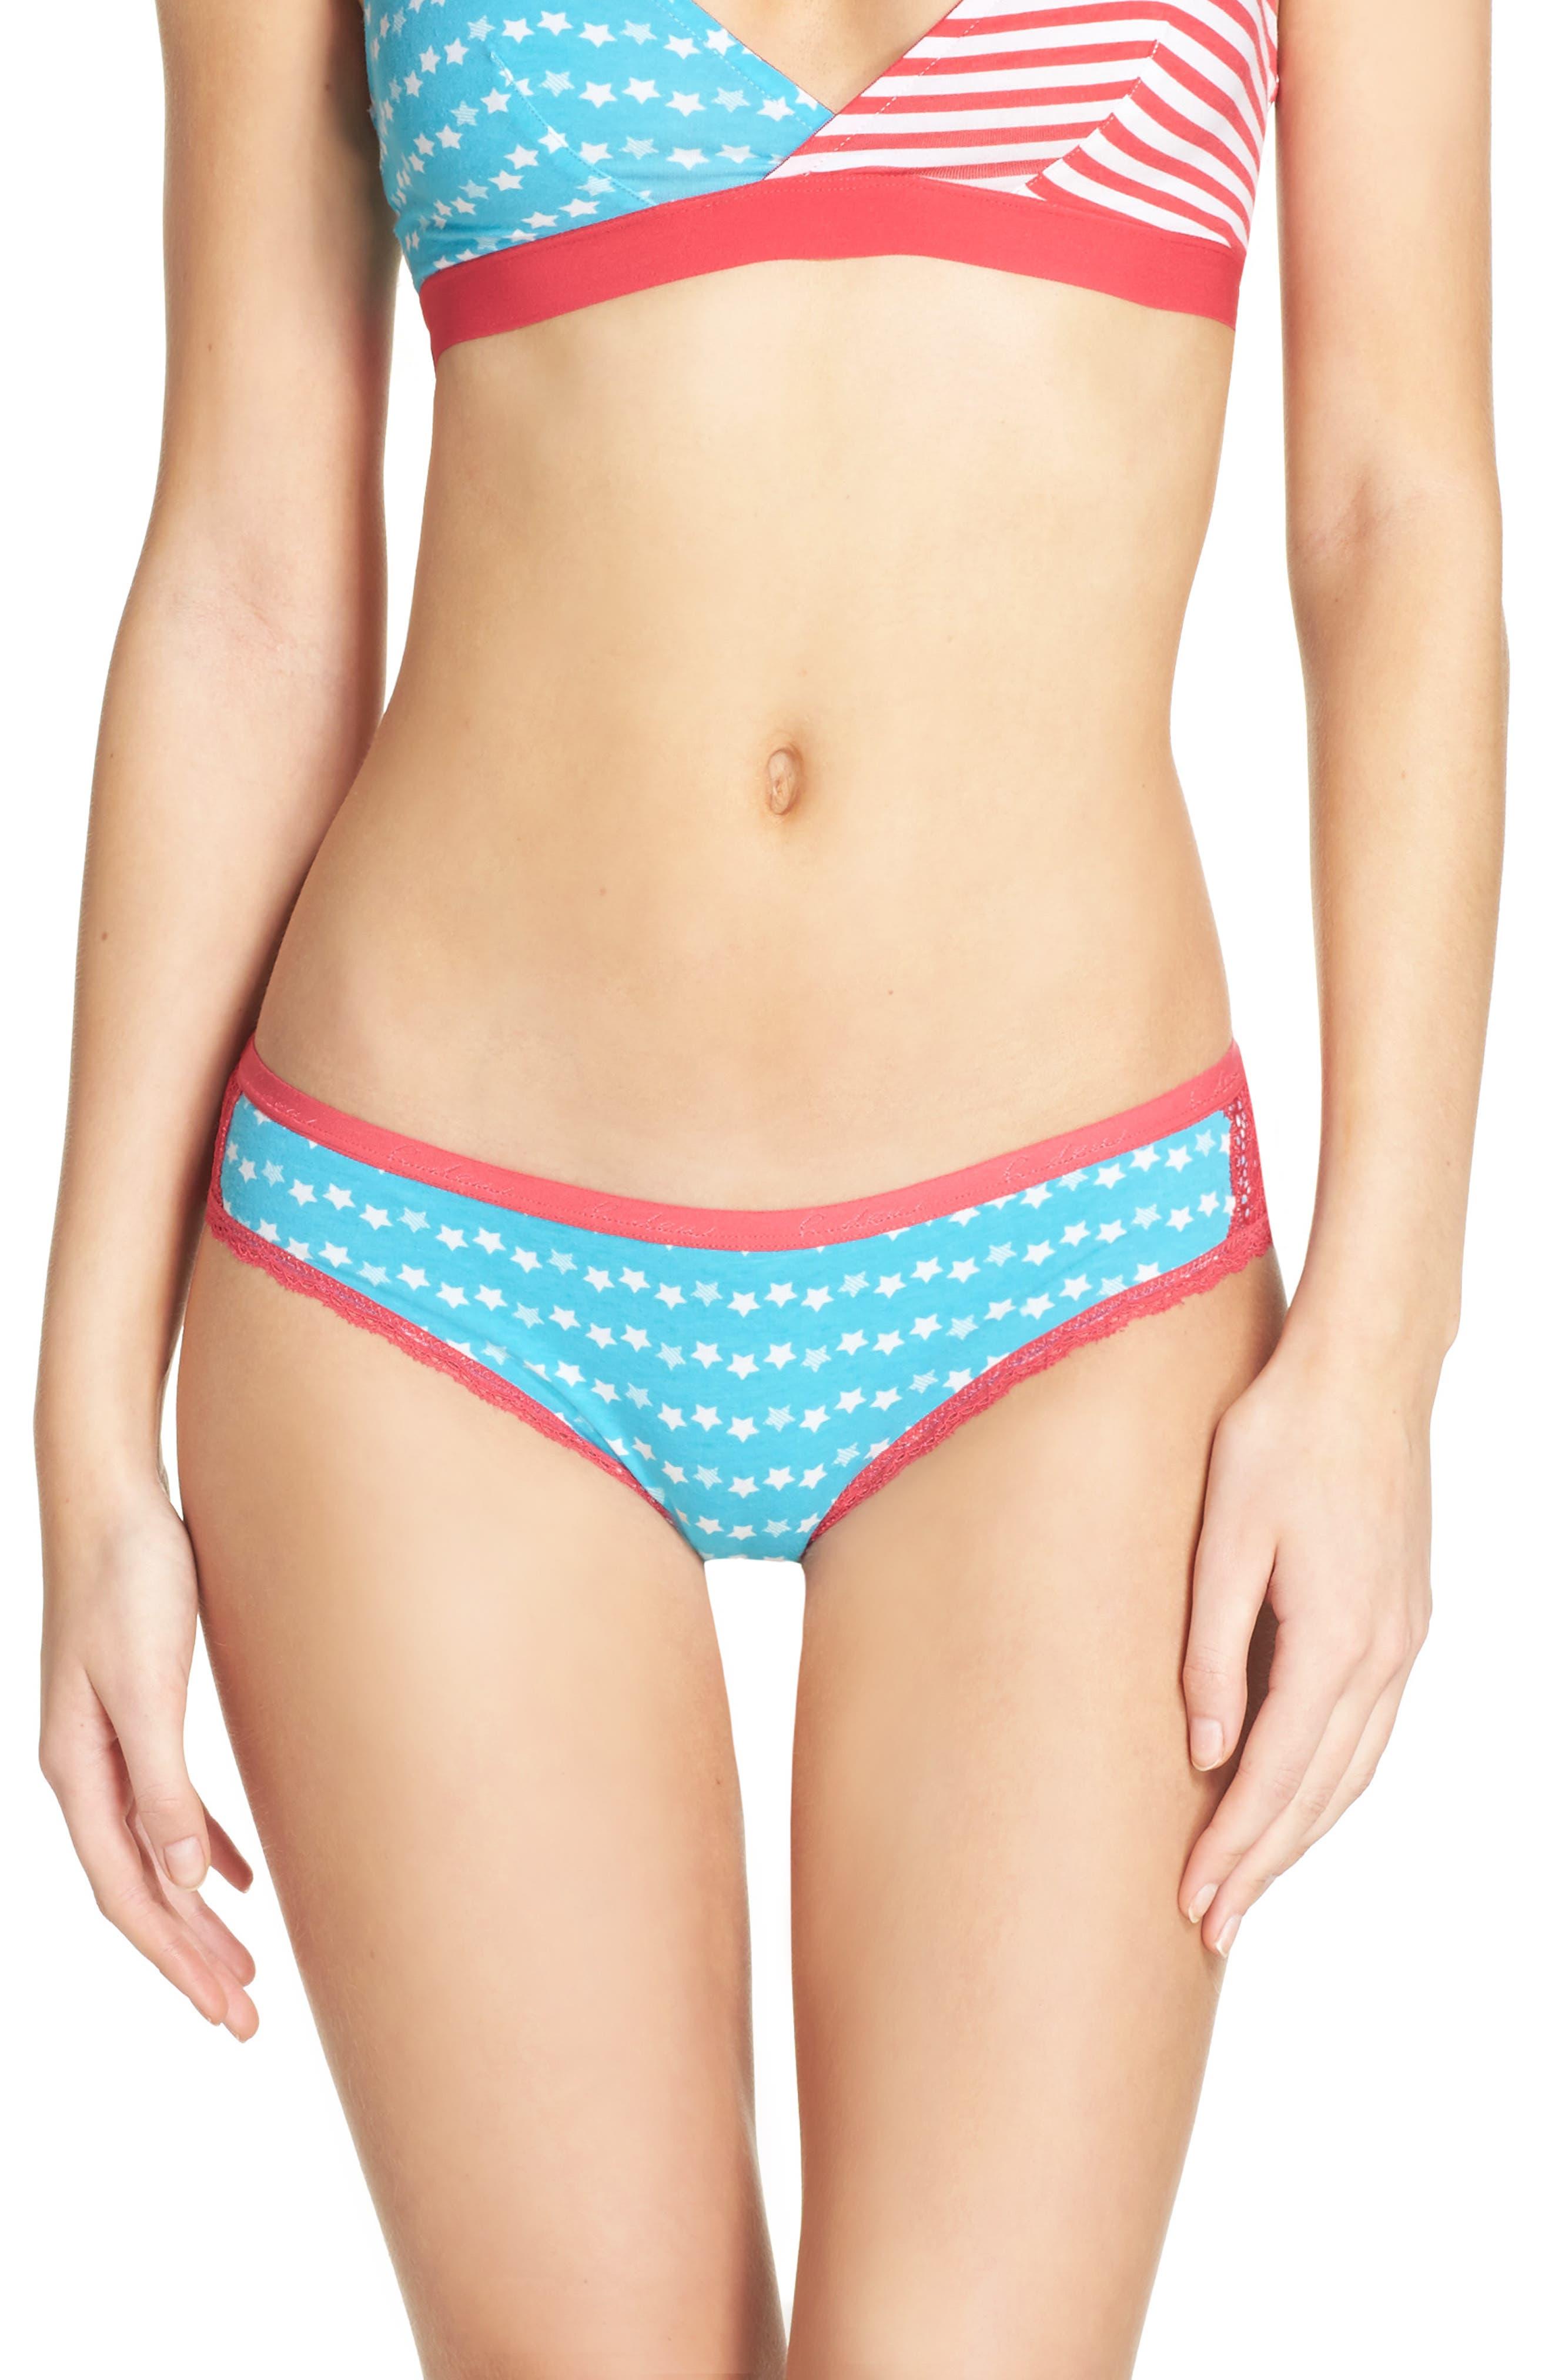 H.DEW 'Jessi' Bikini